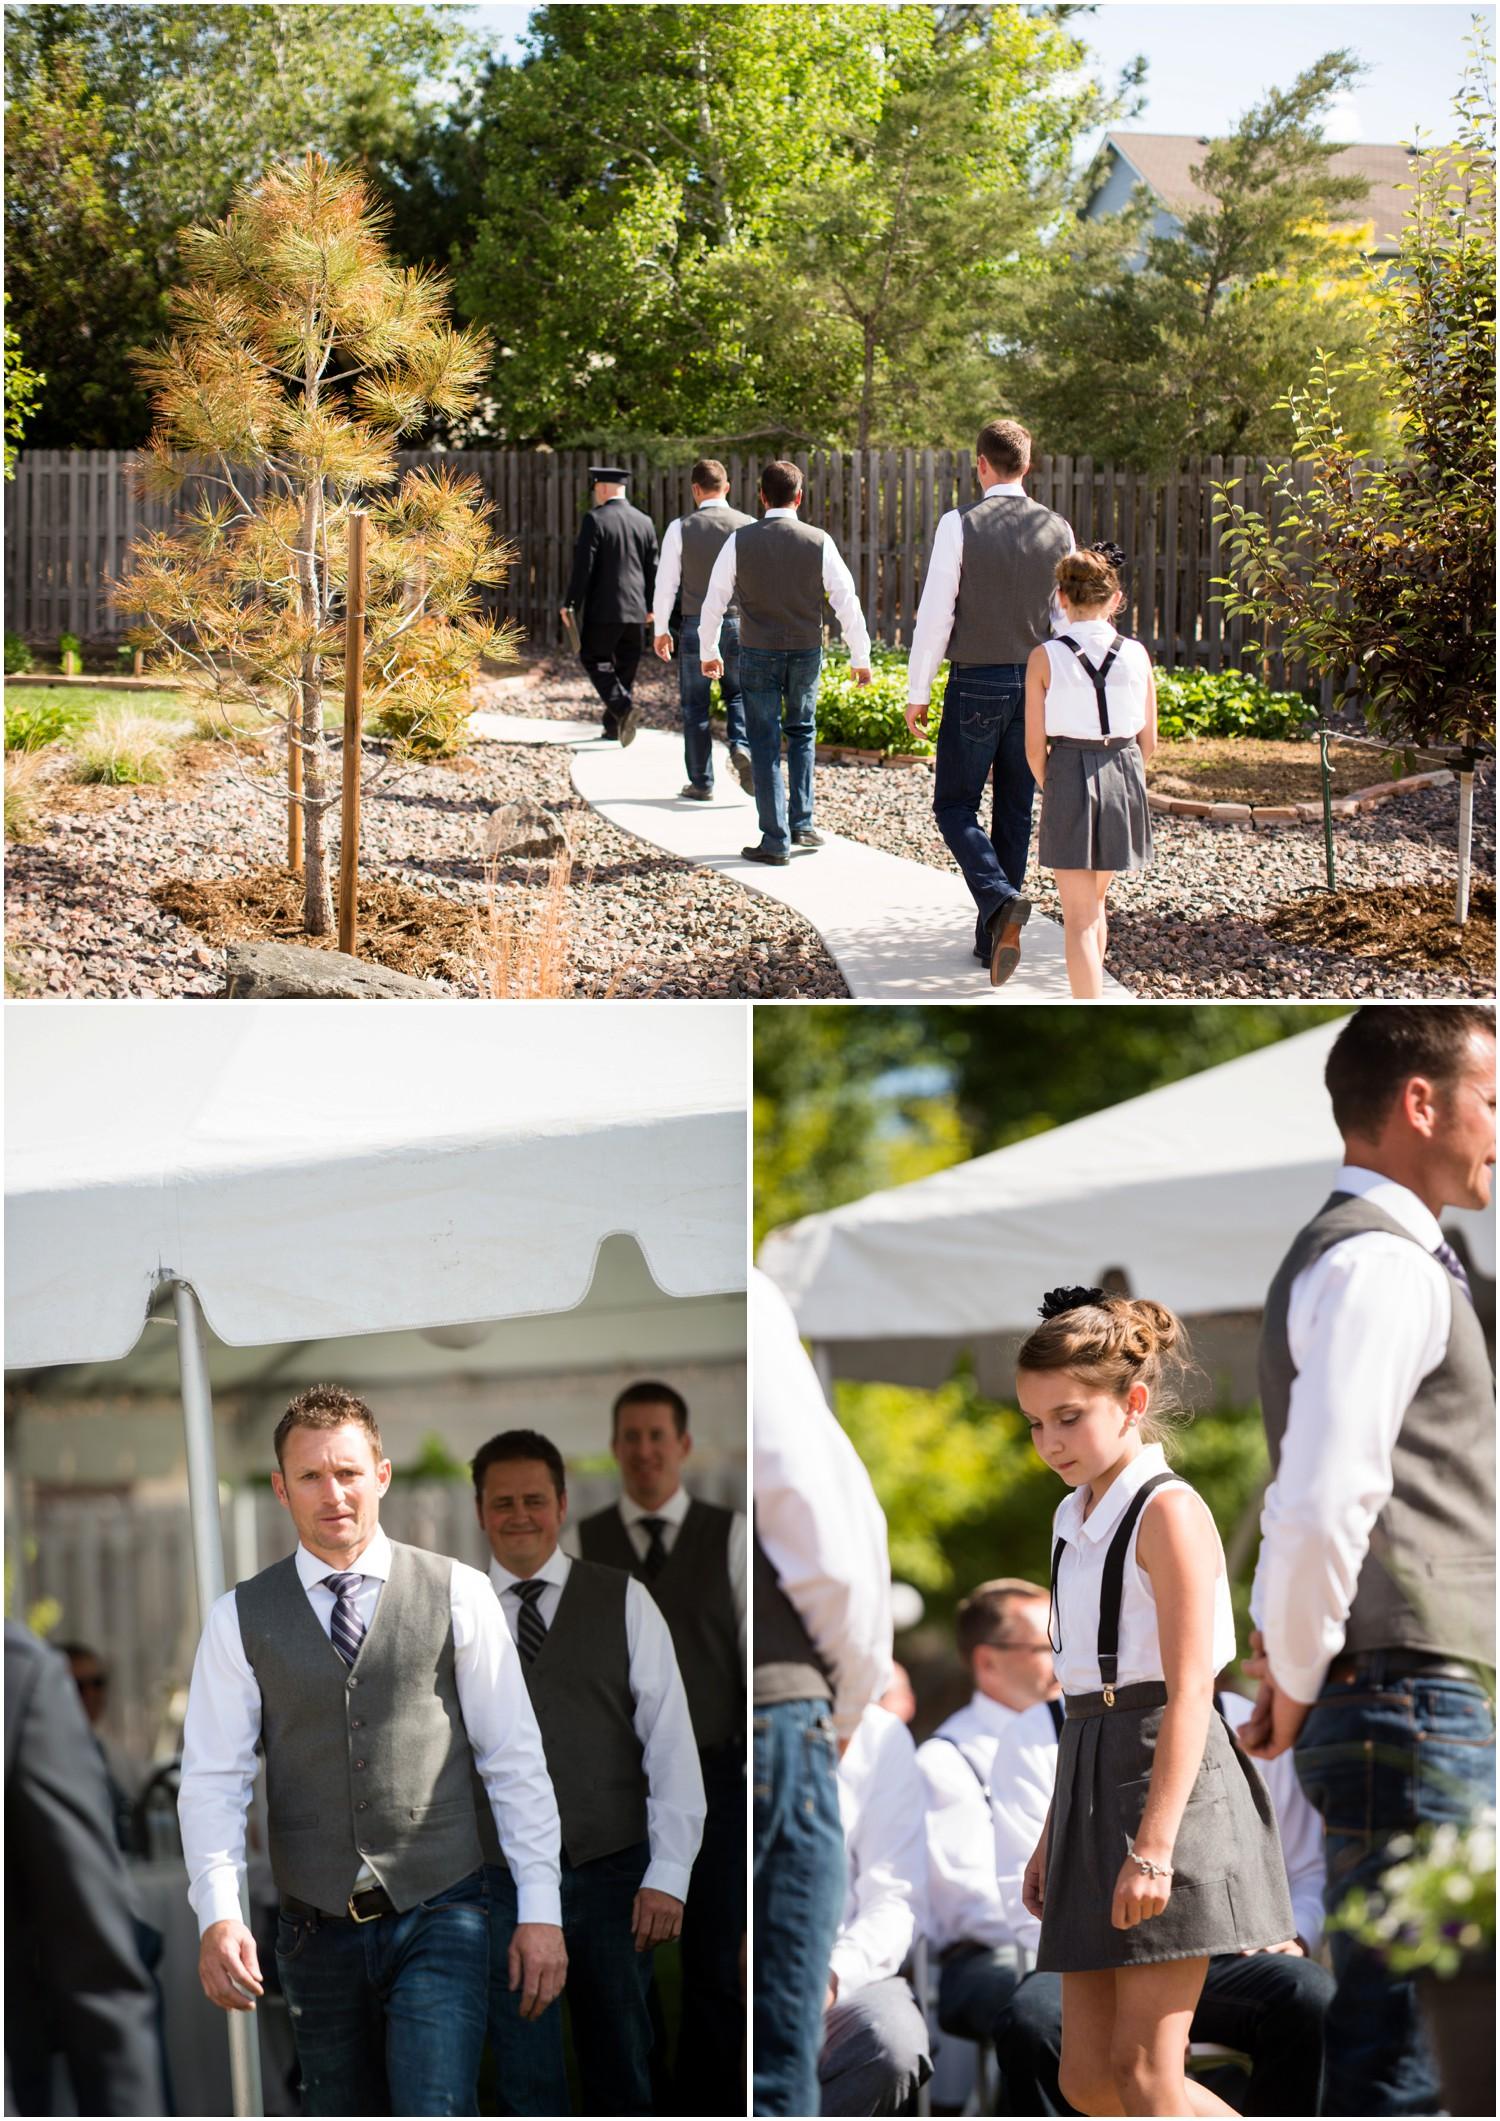 Windsor-colorado-backyard-wedding-photography-_0045.jpg